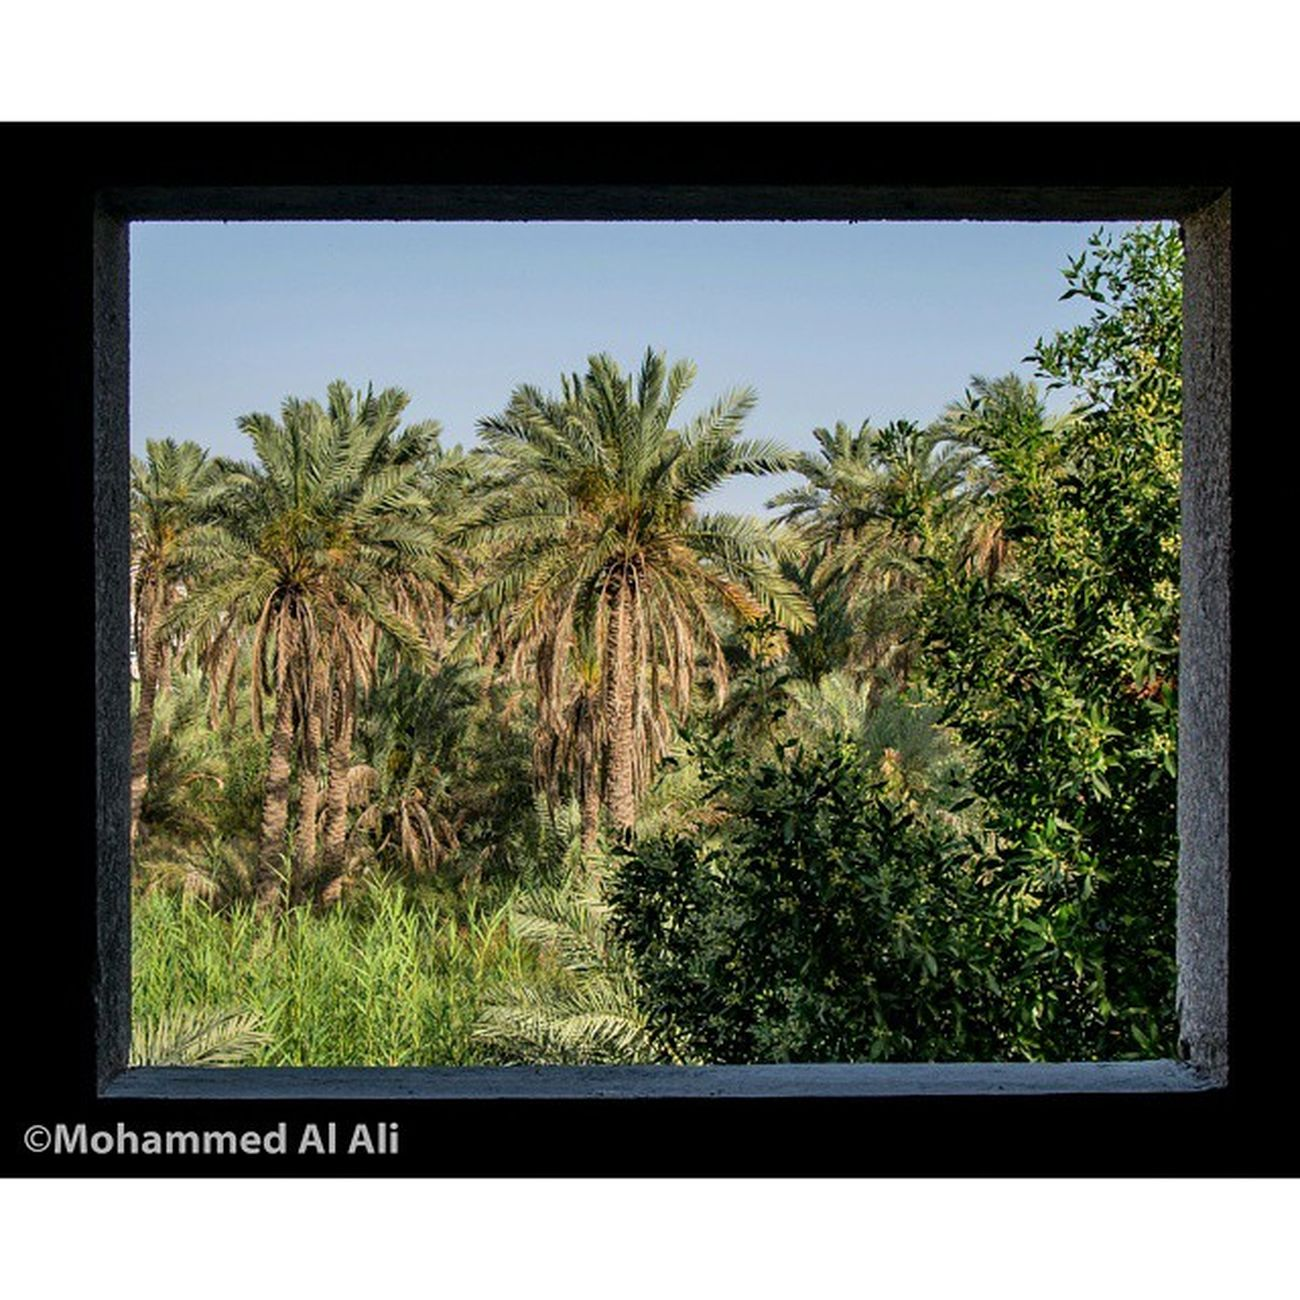 Olympus OlympusPEN PL7 Frame Micro_four_third Mft Palmtrees Basrah Iraq